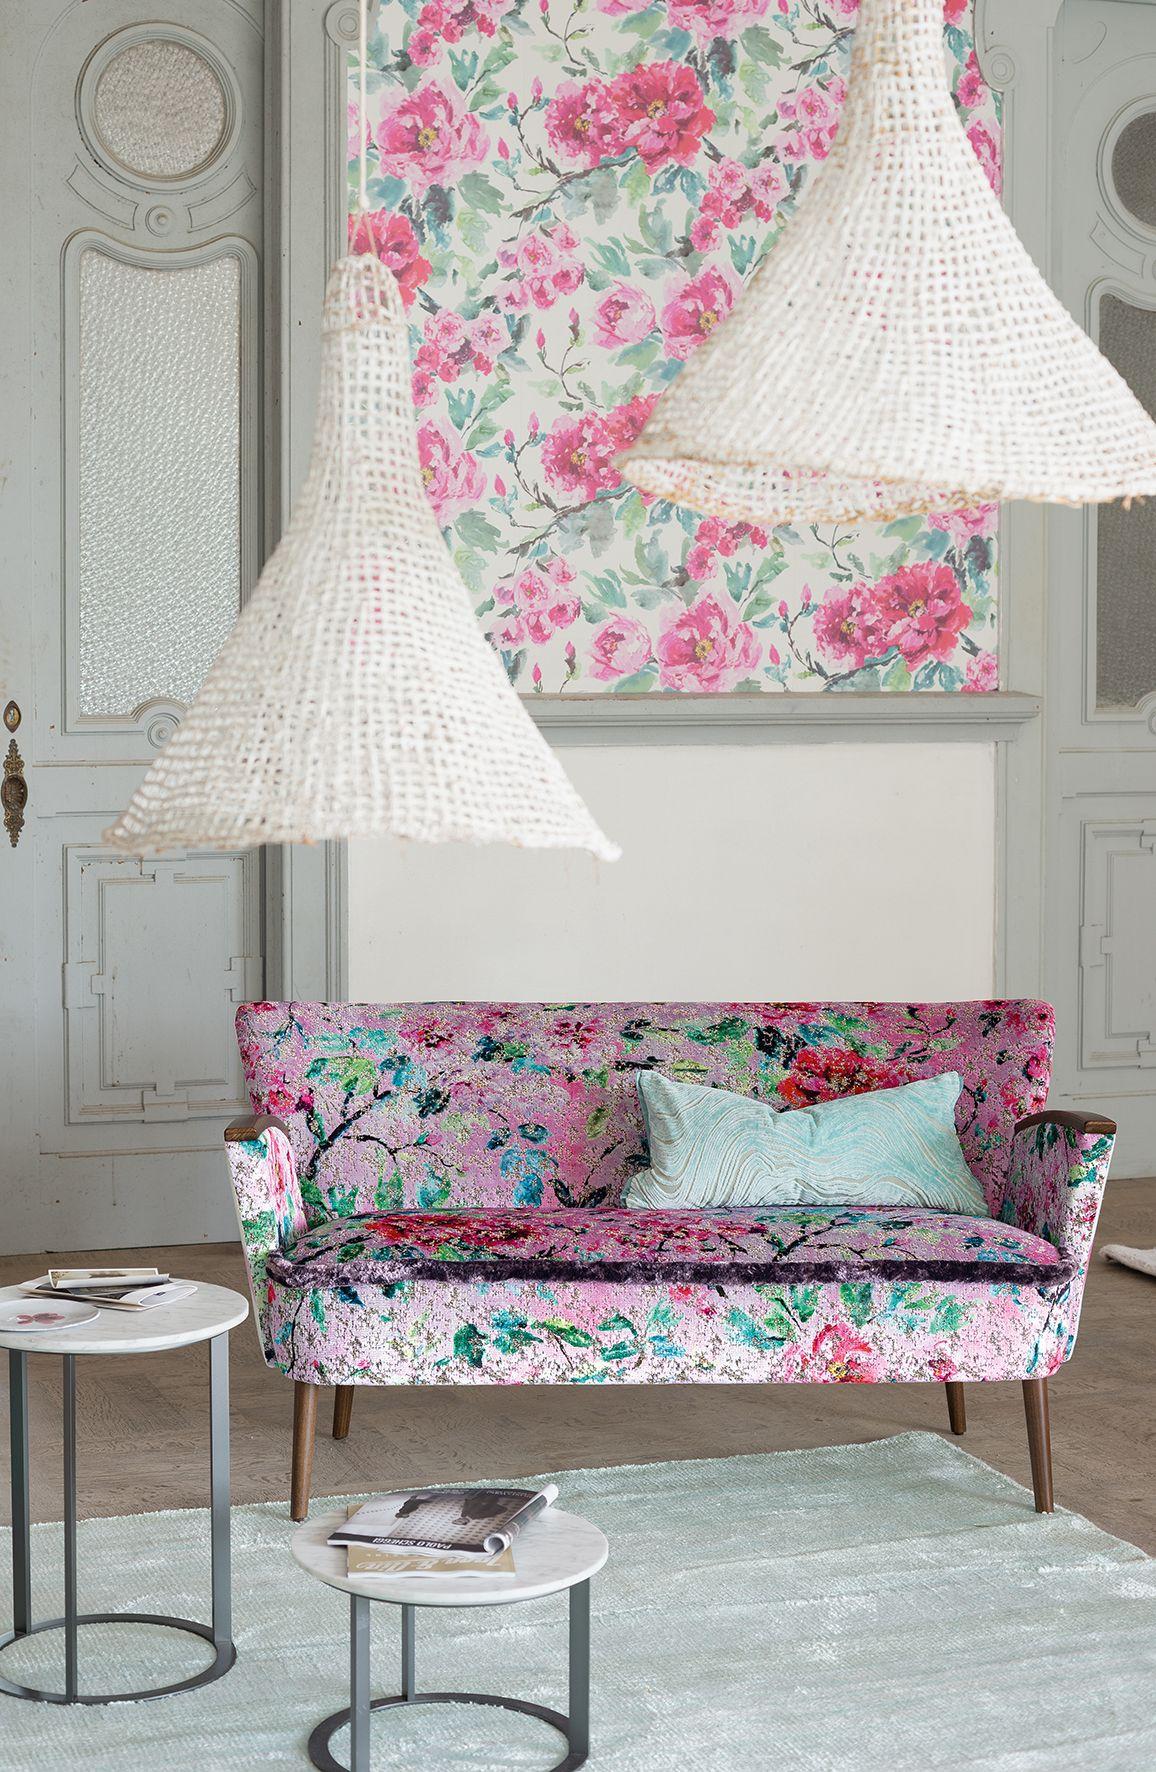 Design My Living Room Online: Www.insideyourhome.co Inspiration For Living Room